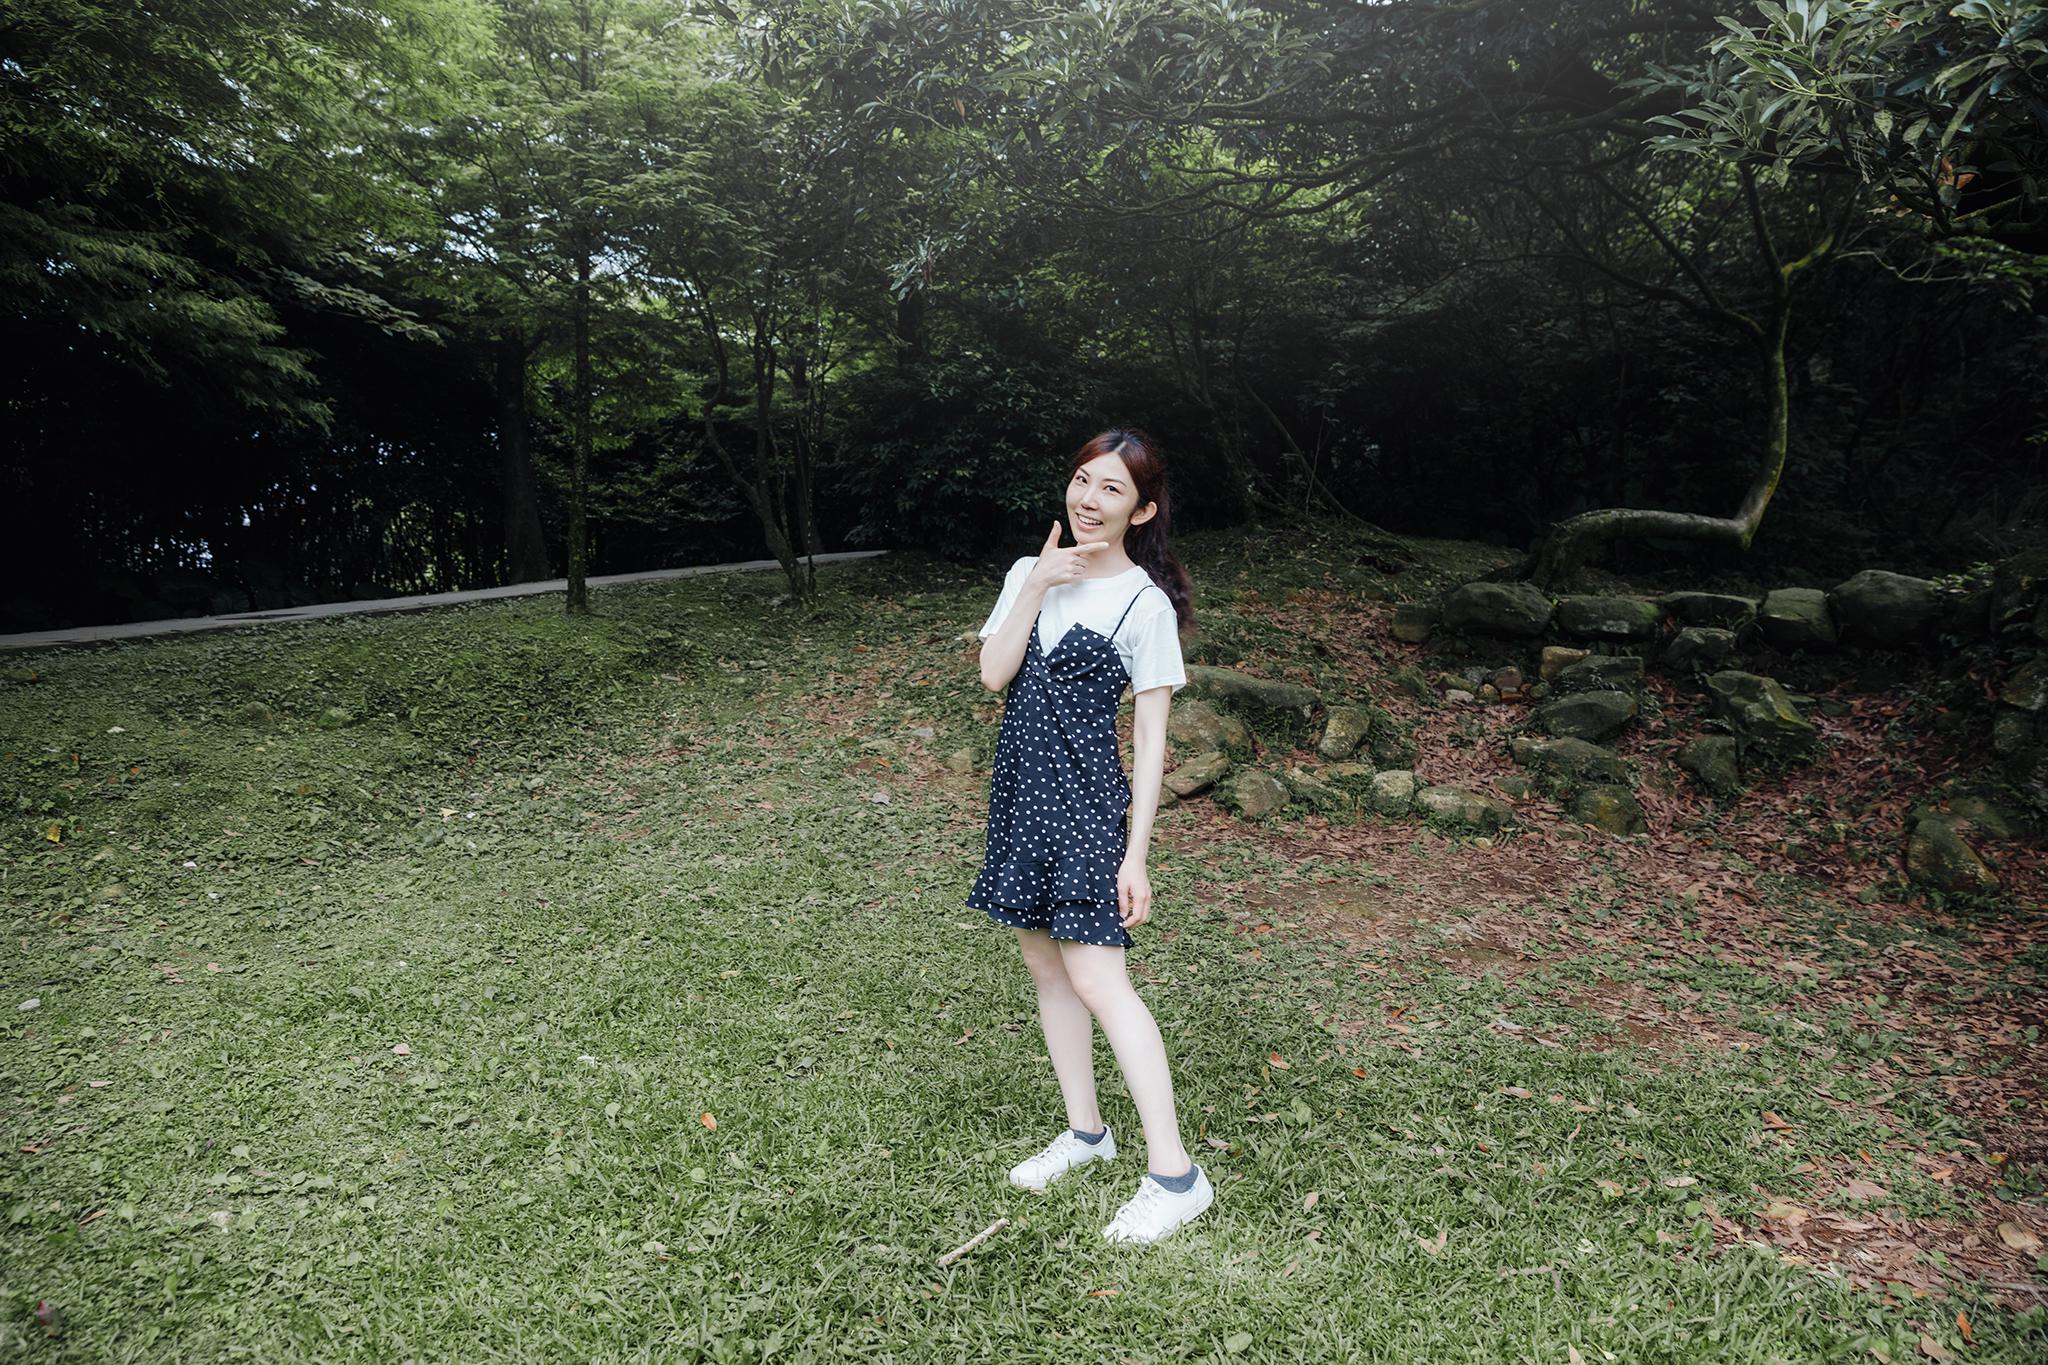 50029710208 9b041c01d5 o - 【夏季寫真】+Shan+